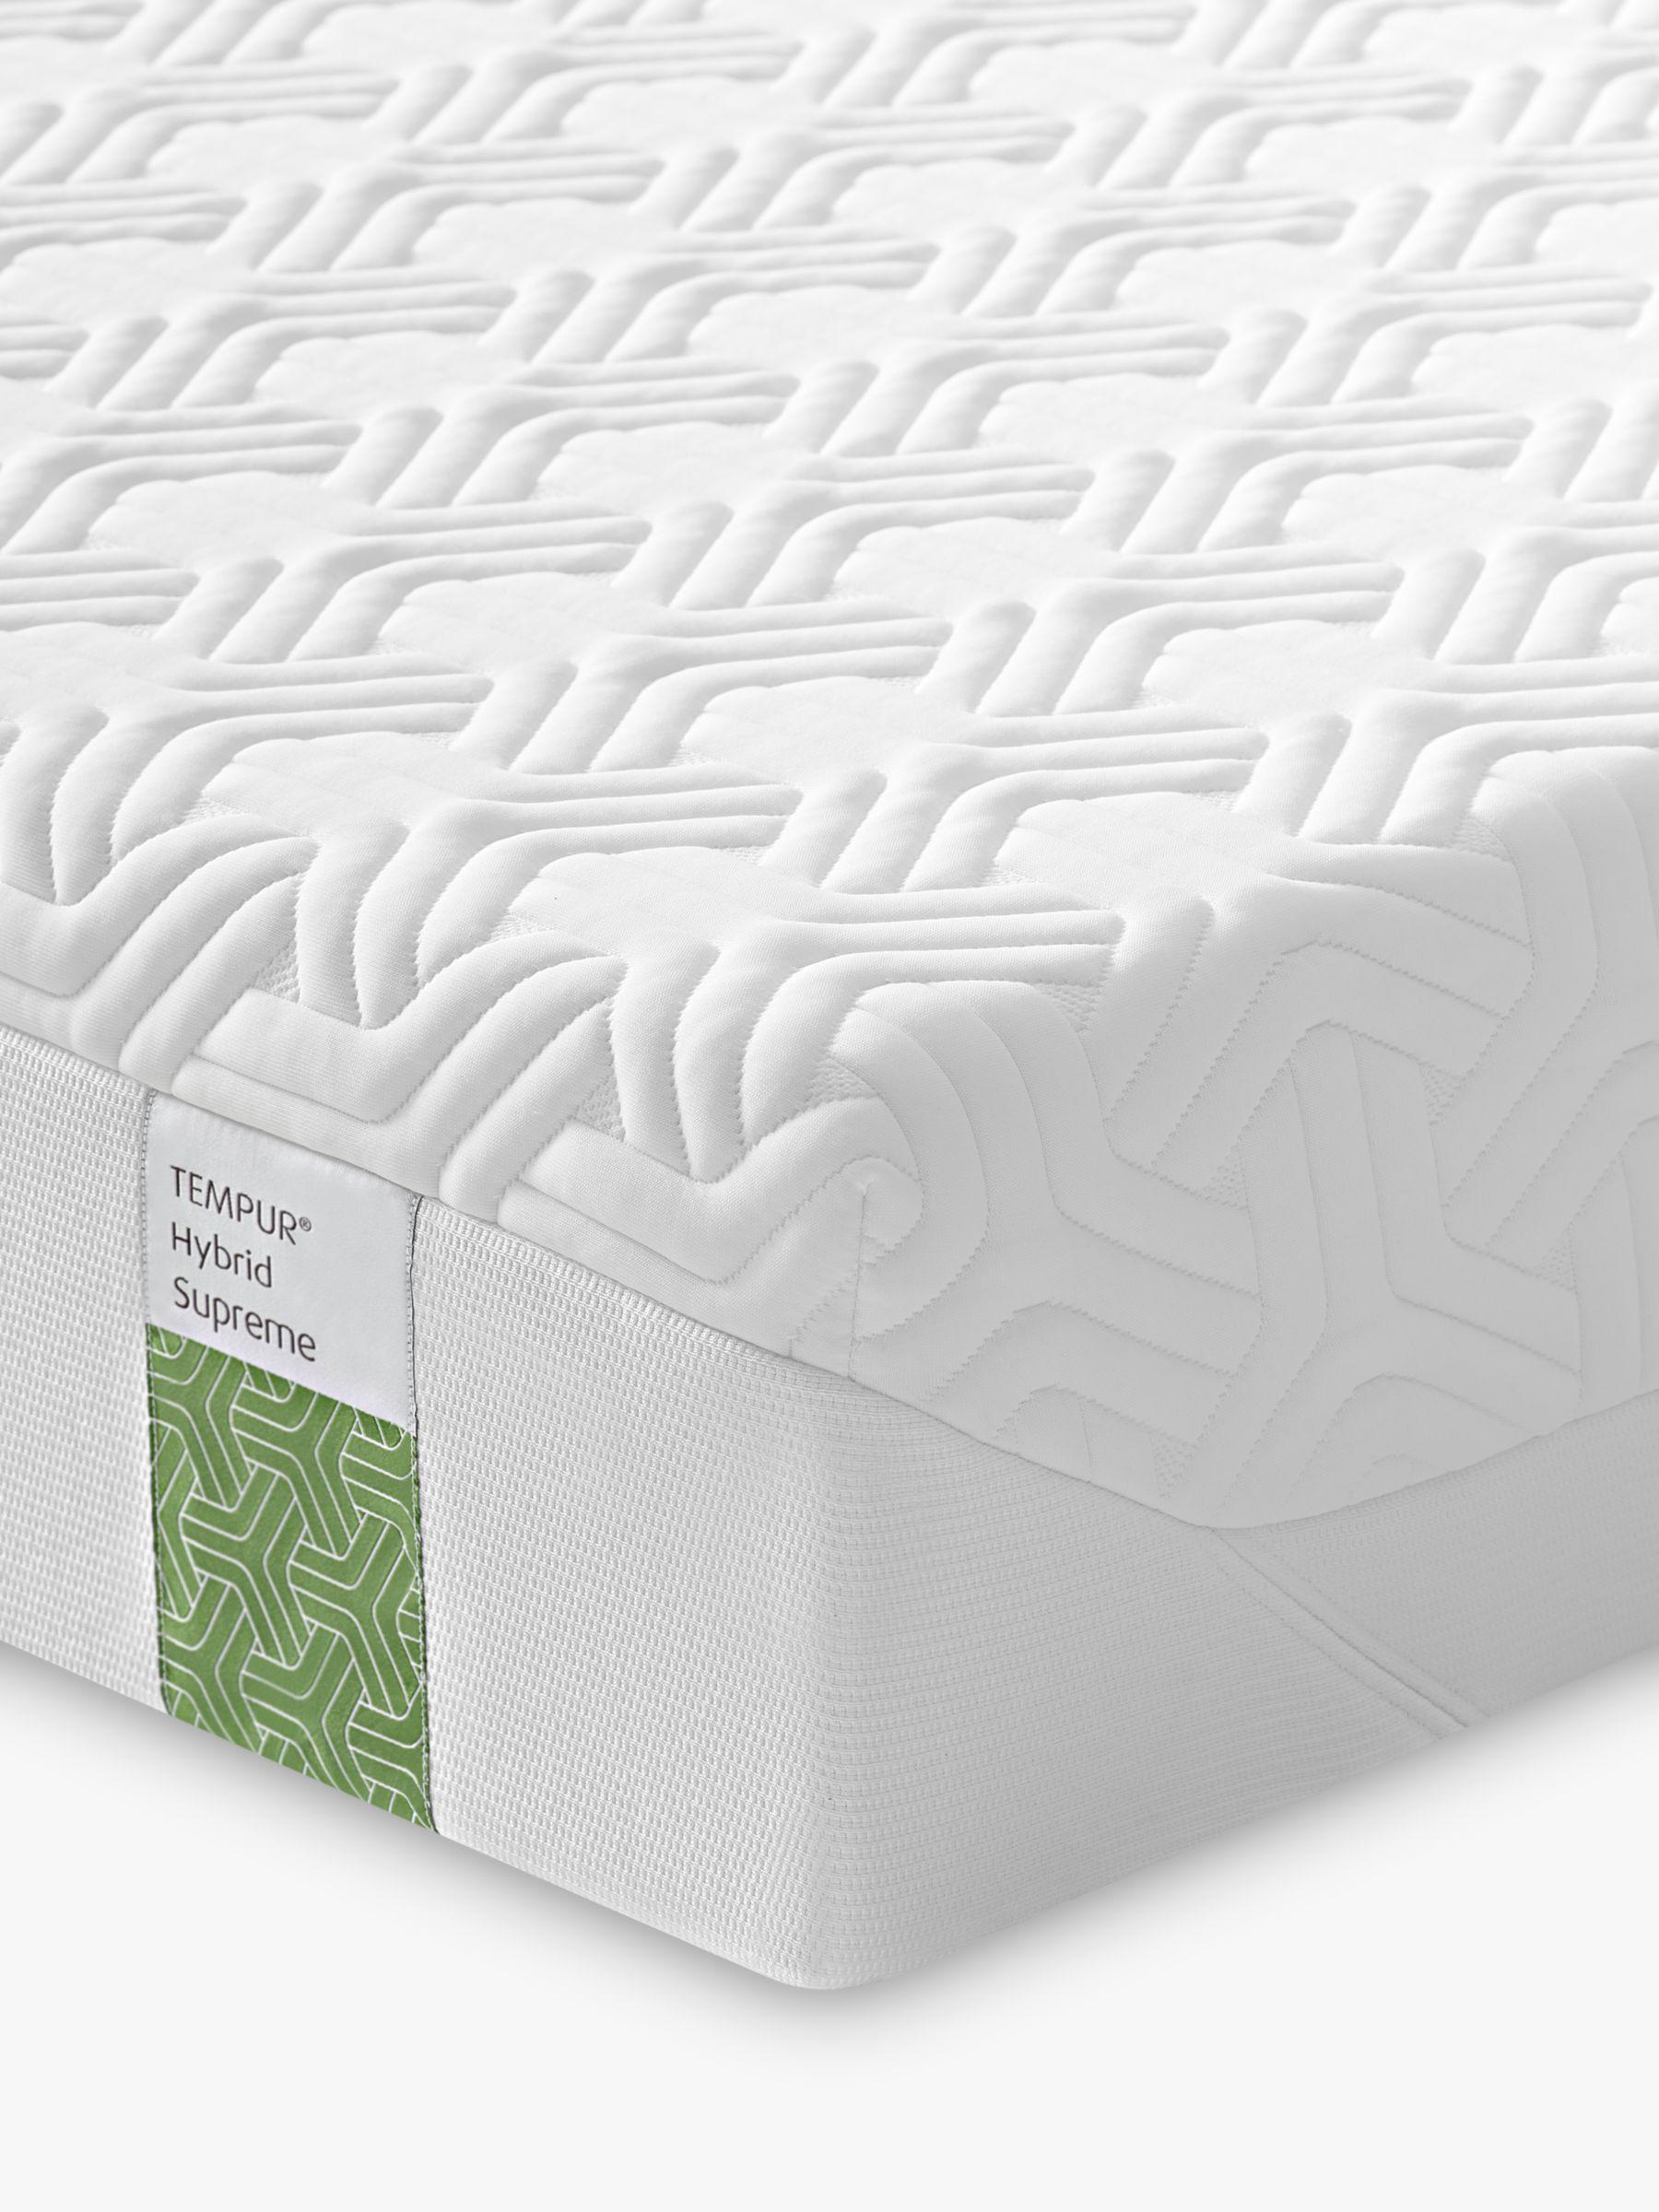 Tempur Tempur Hybrid Supreme 21 Pocket Spring Memory Foam Mattress, Medium Tension, Continental King Size